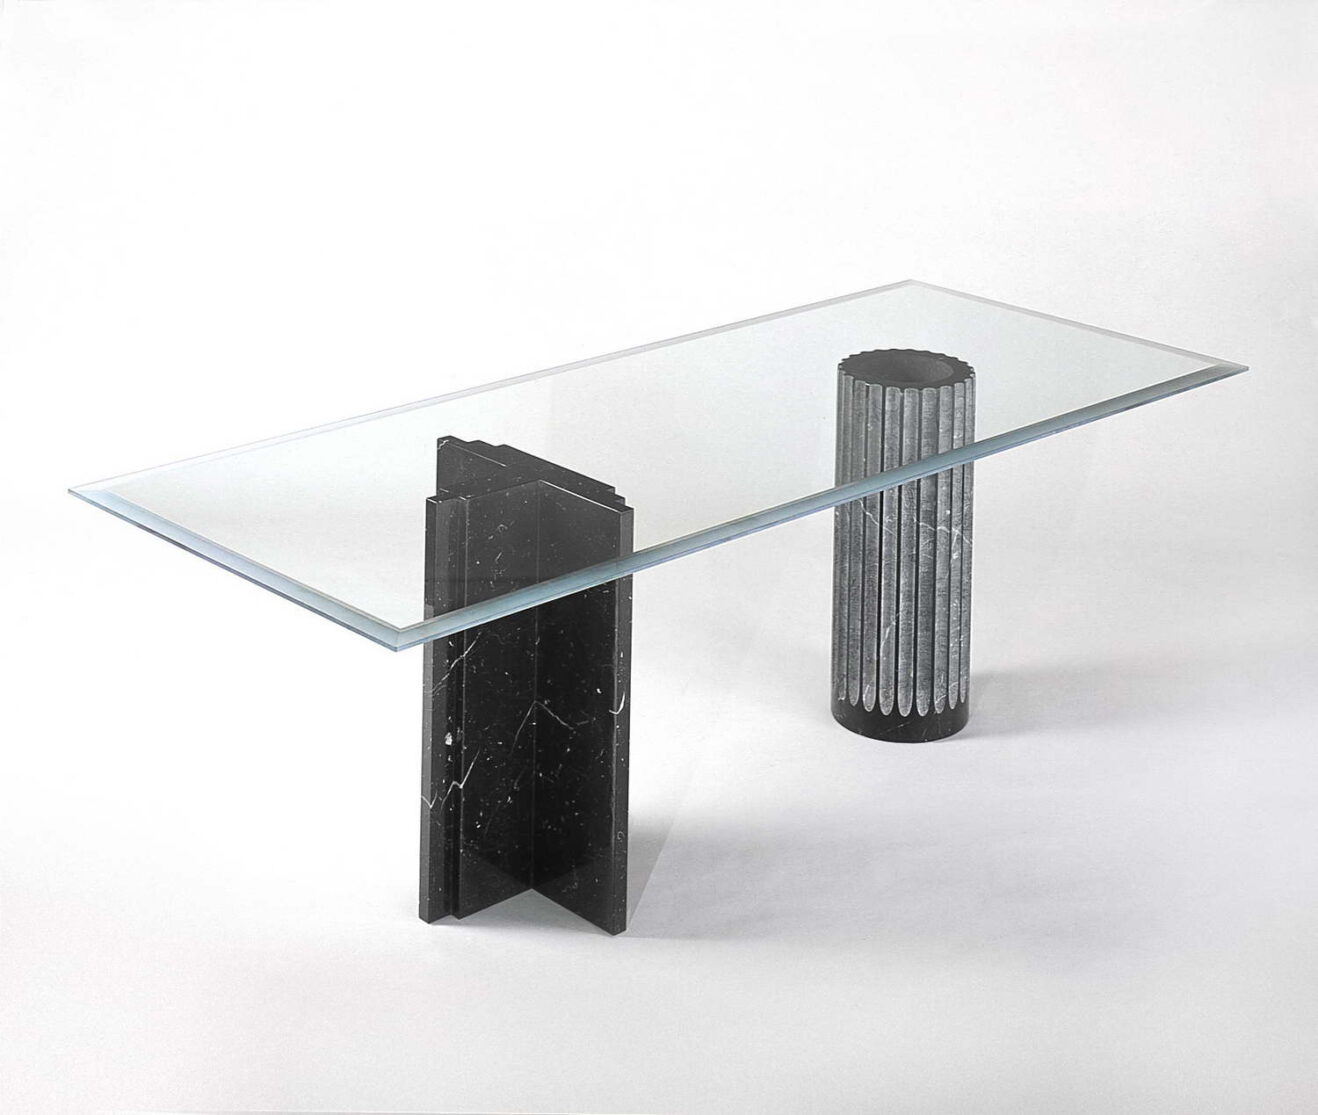 Adolfo-Natalini-Table-Antiquaria-4850